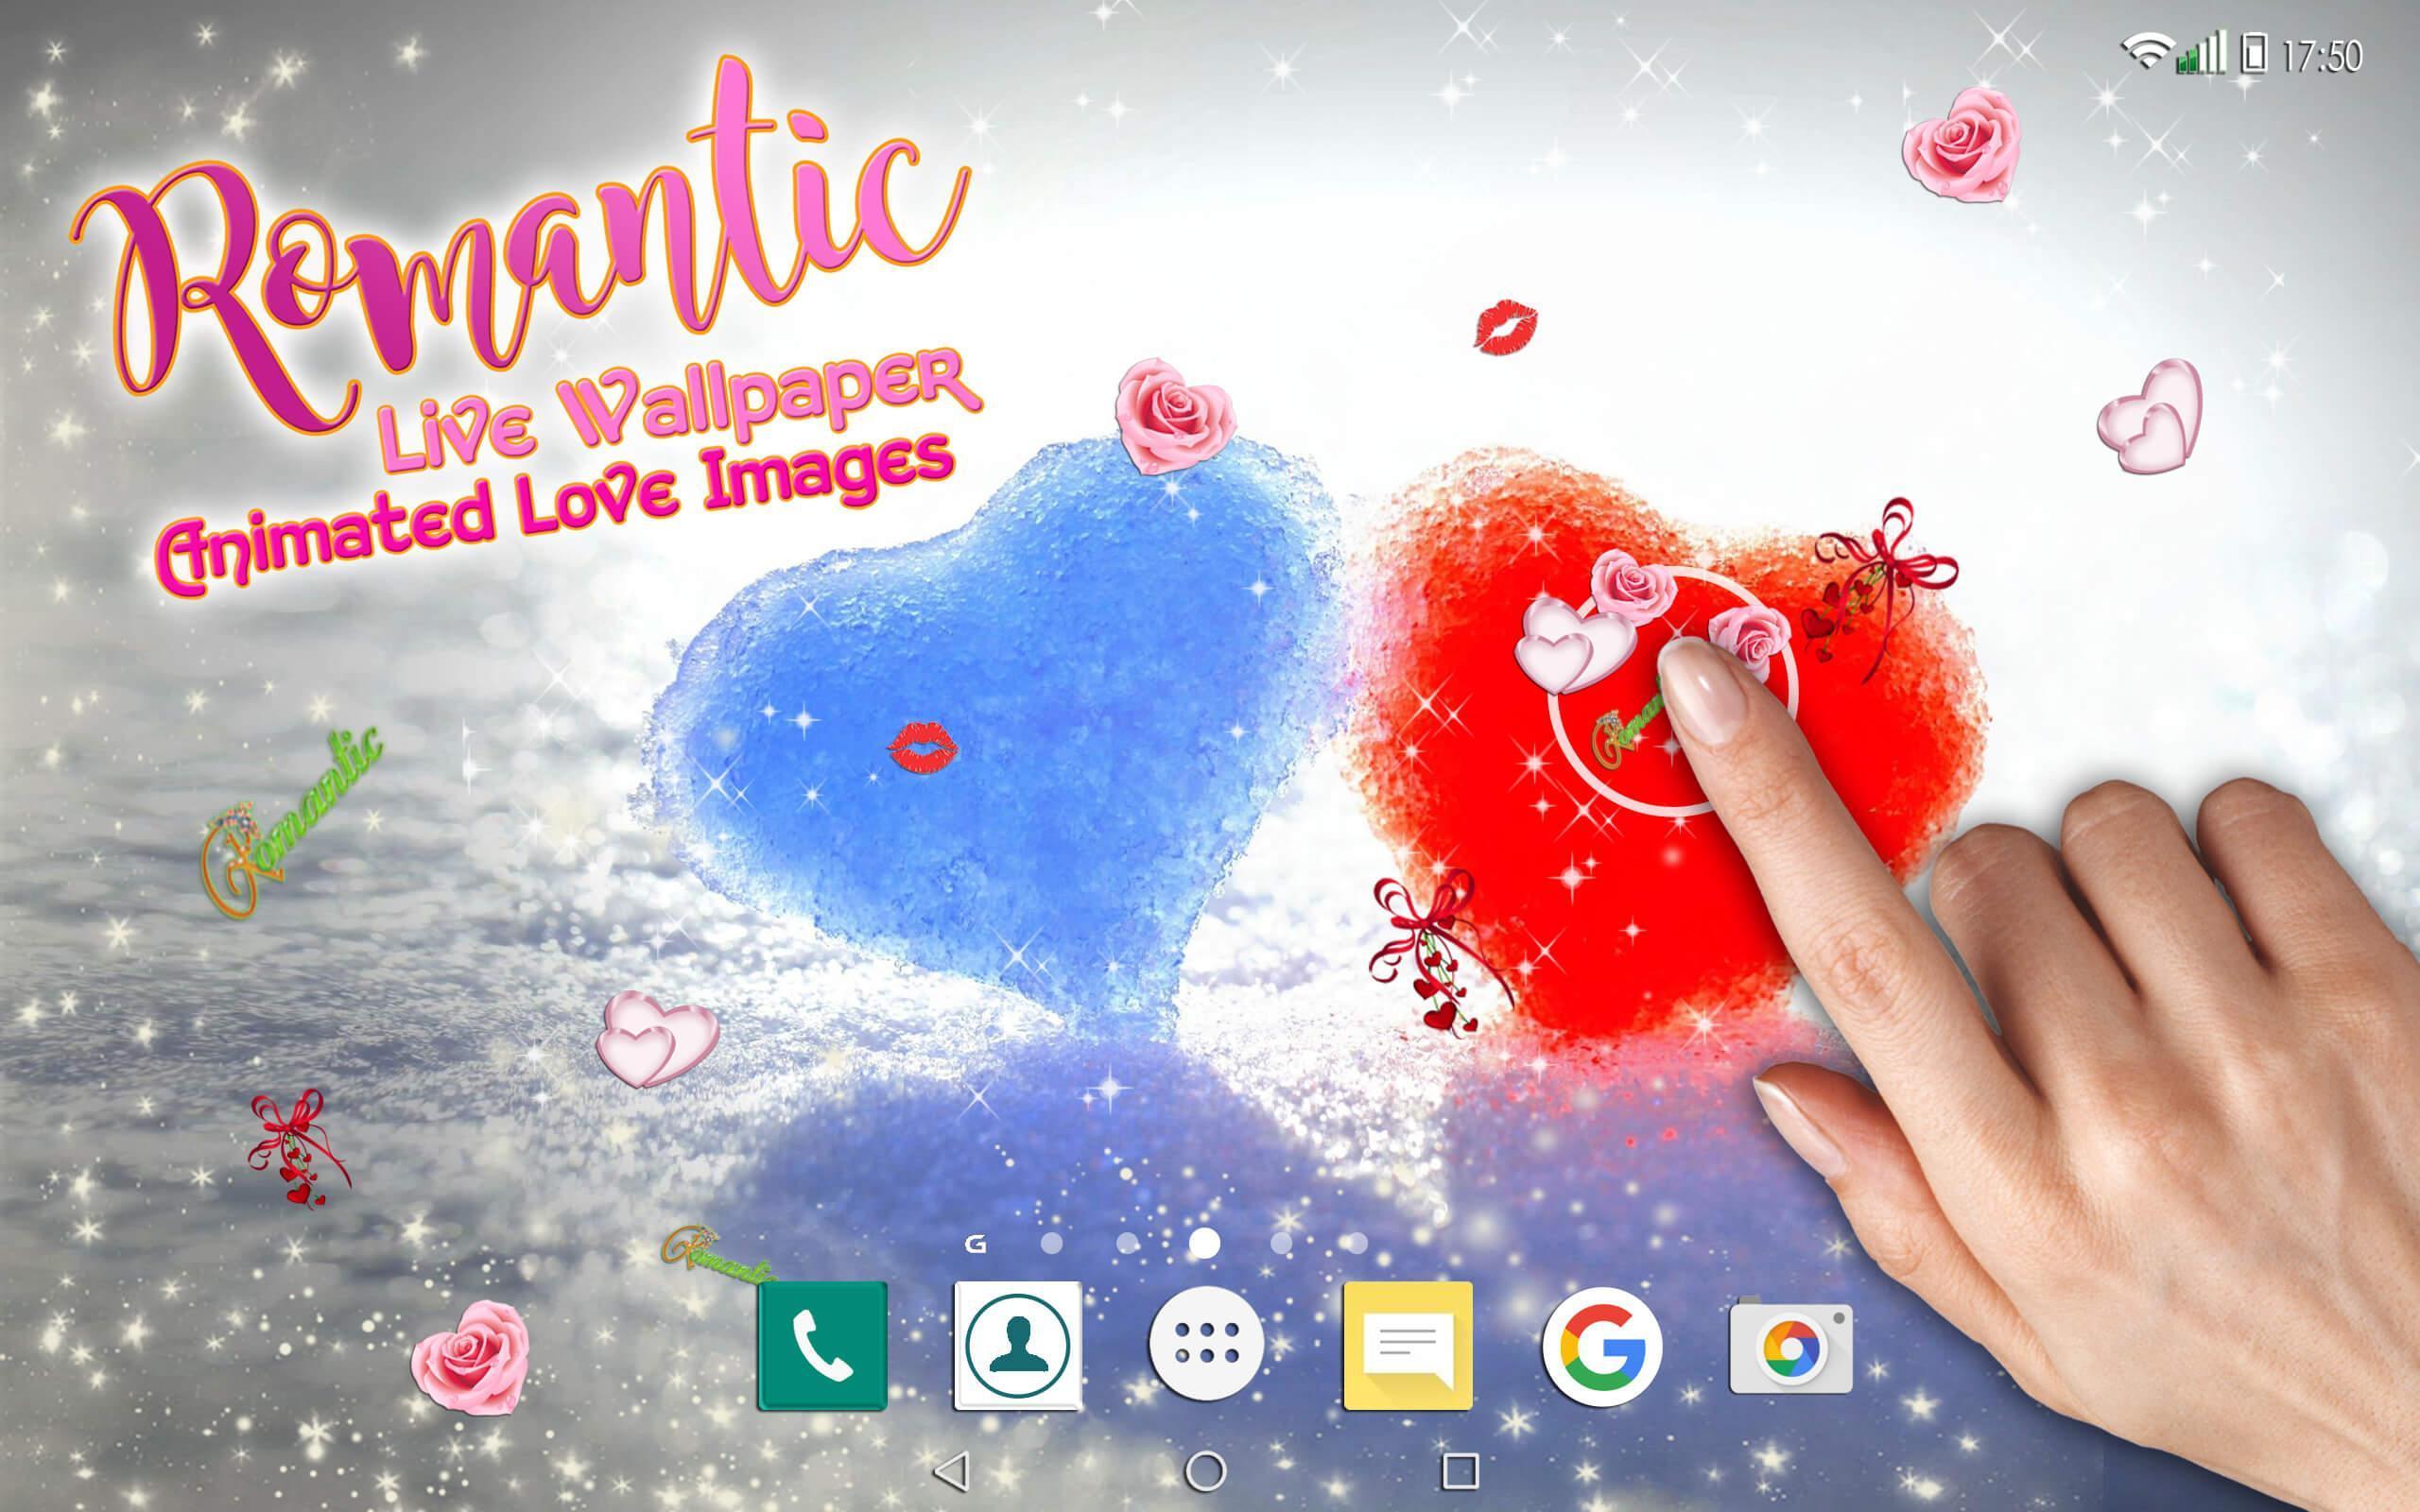 Wallpaper Cinta Romantis Bergerak 💝 Gambar Cinta For